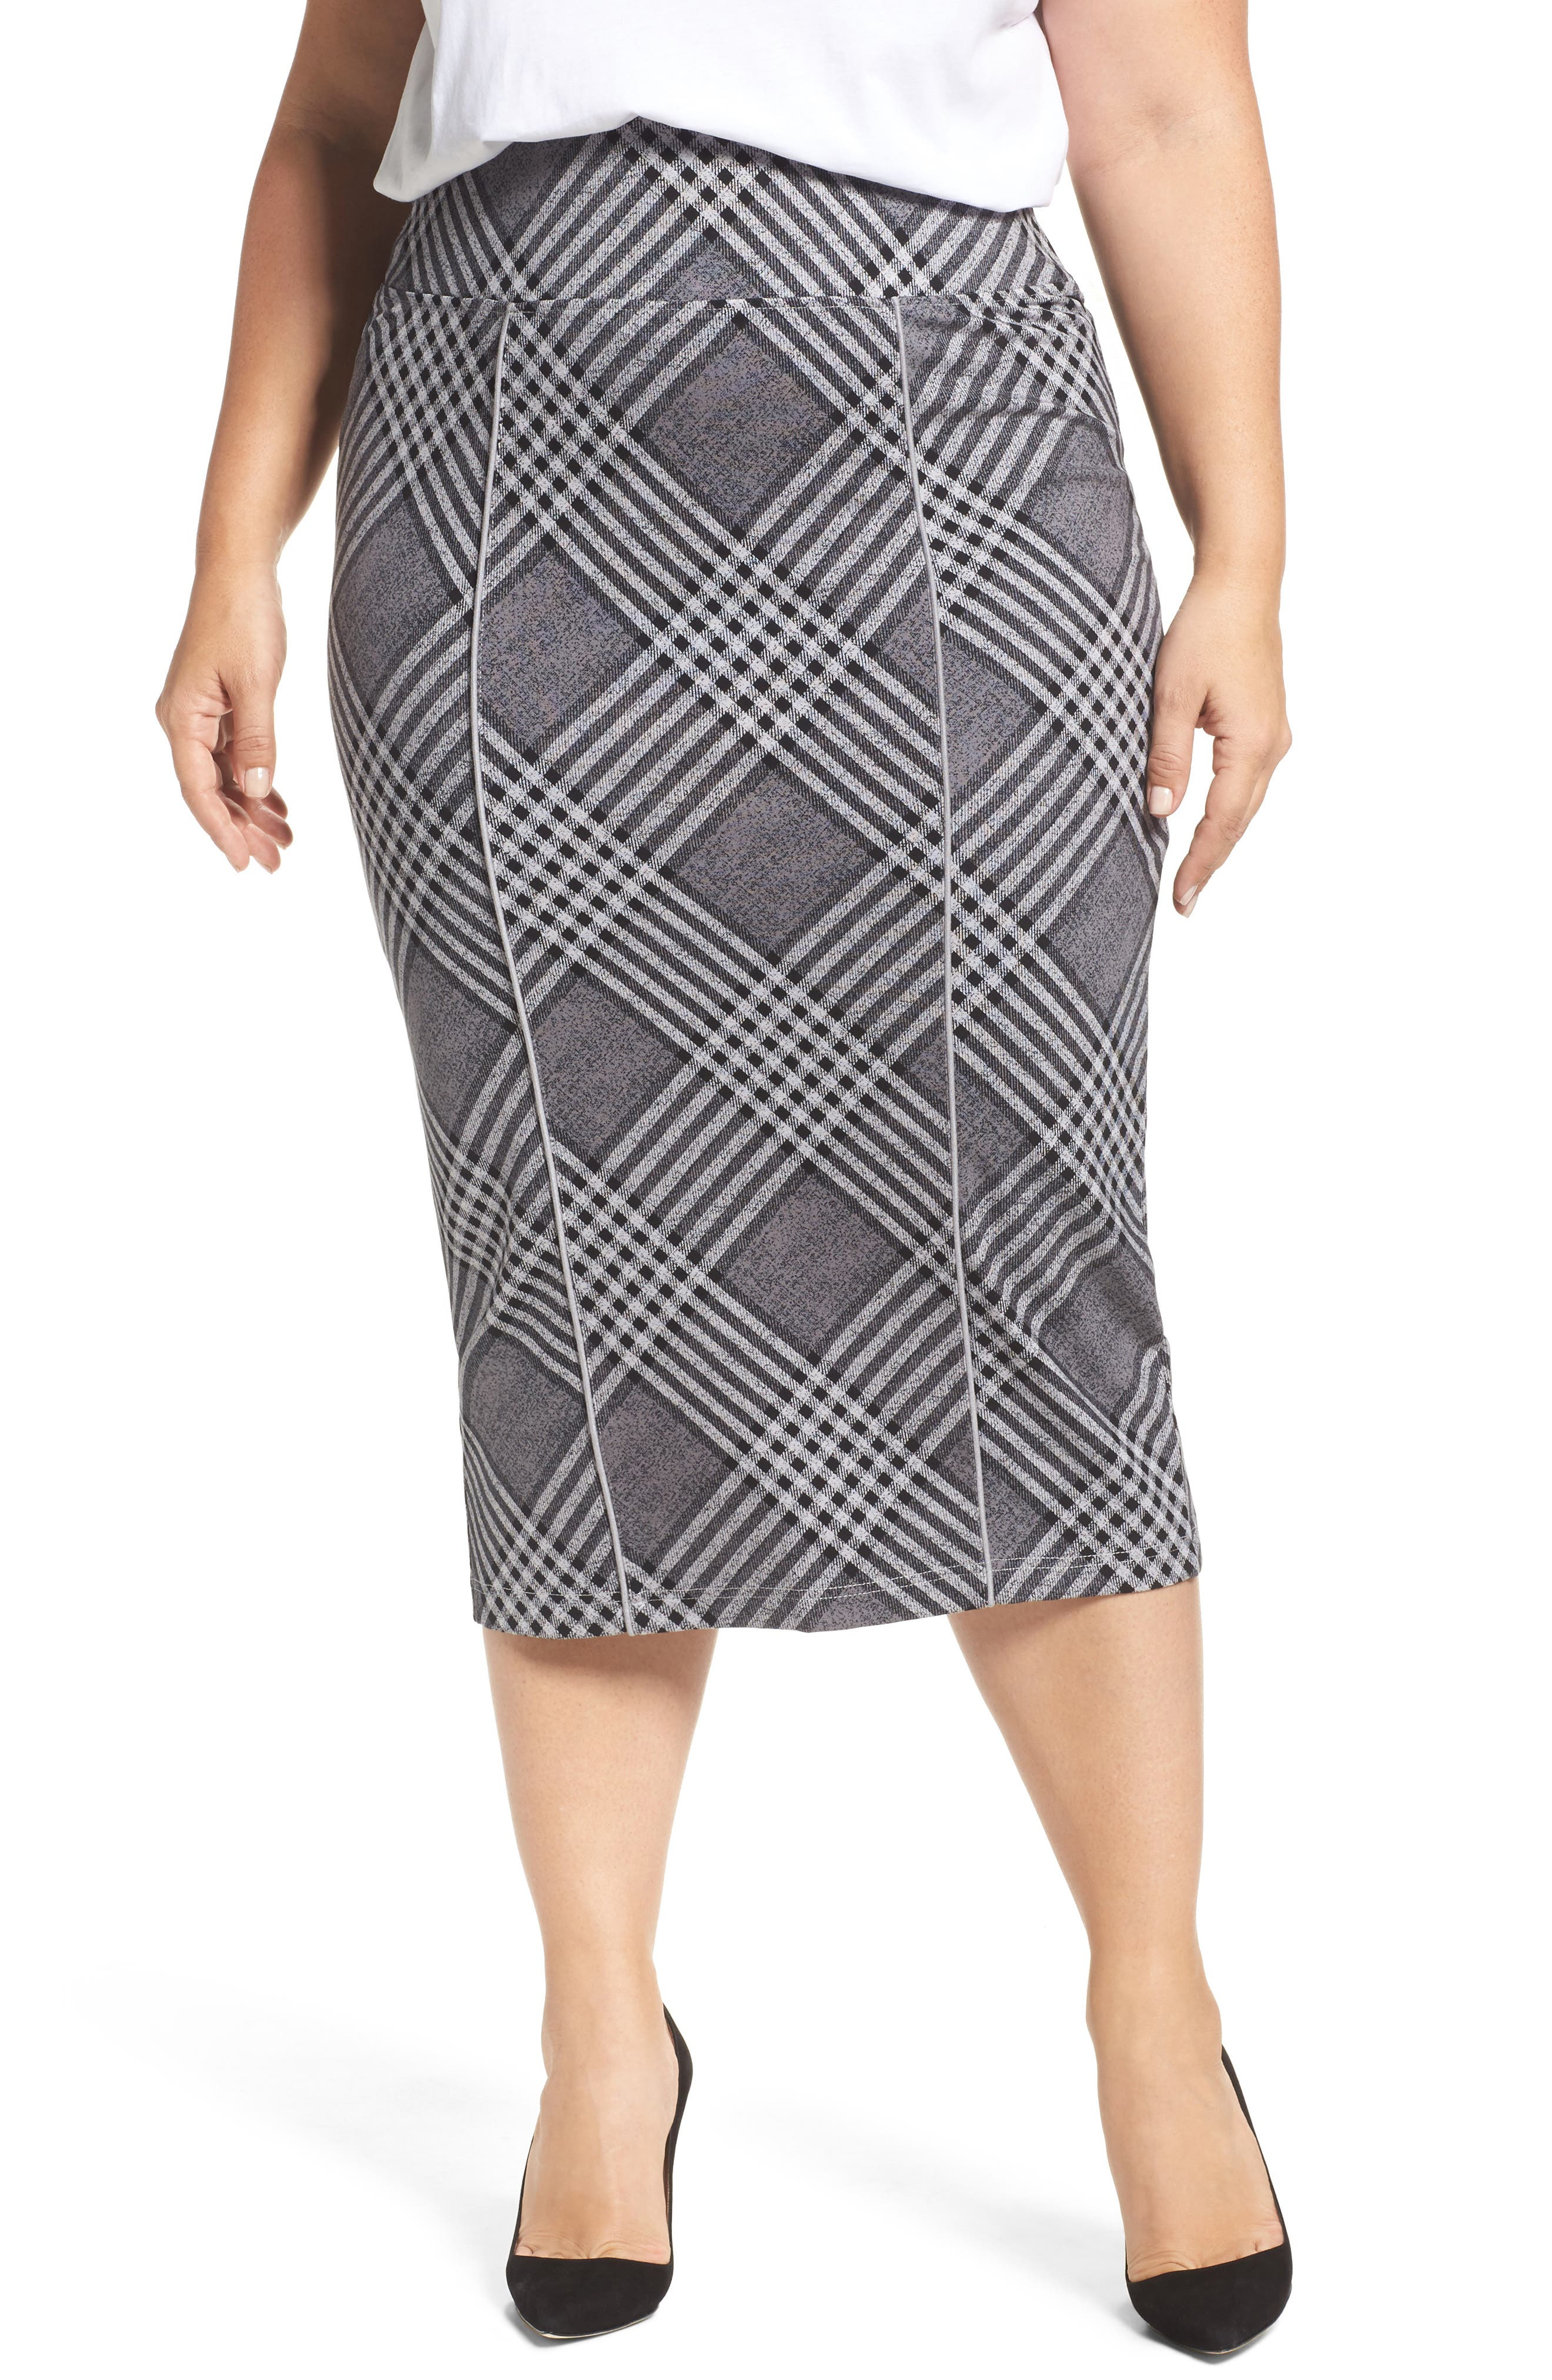 Alternate Image 1 Selected - Melissa McCarthy Seven7 Plaid Pencil Skirt (Plus Size)